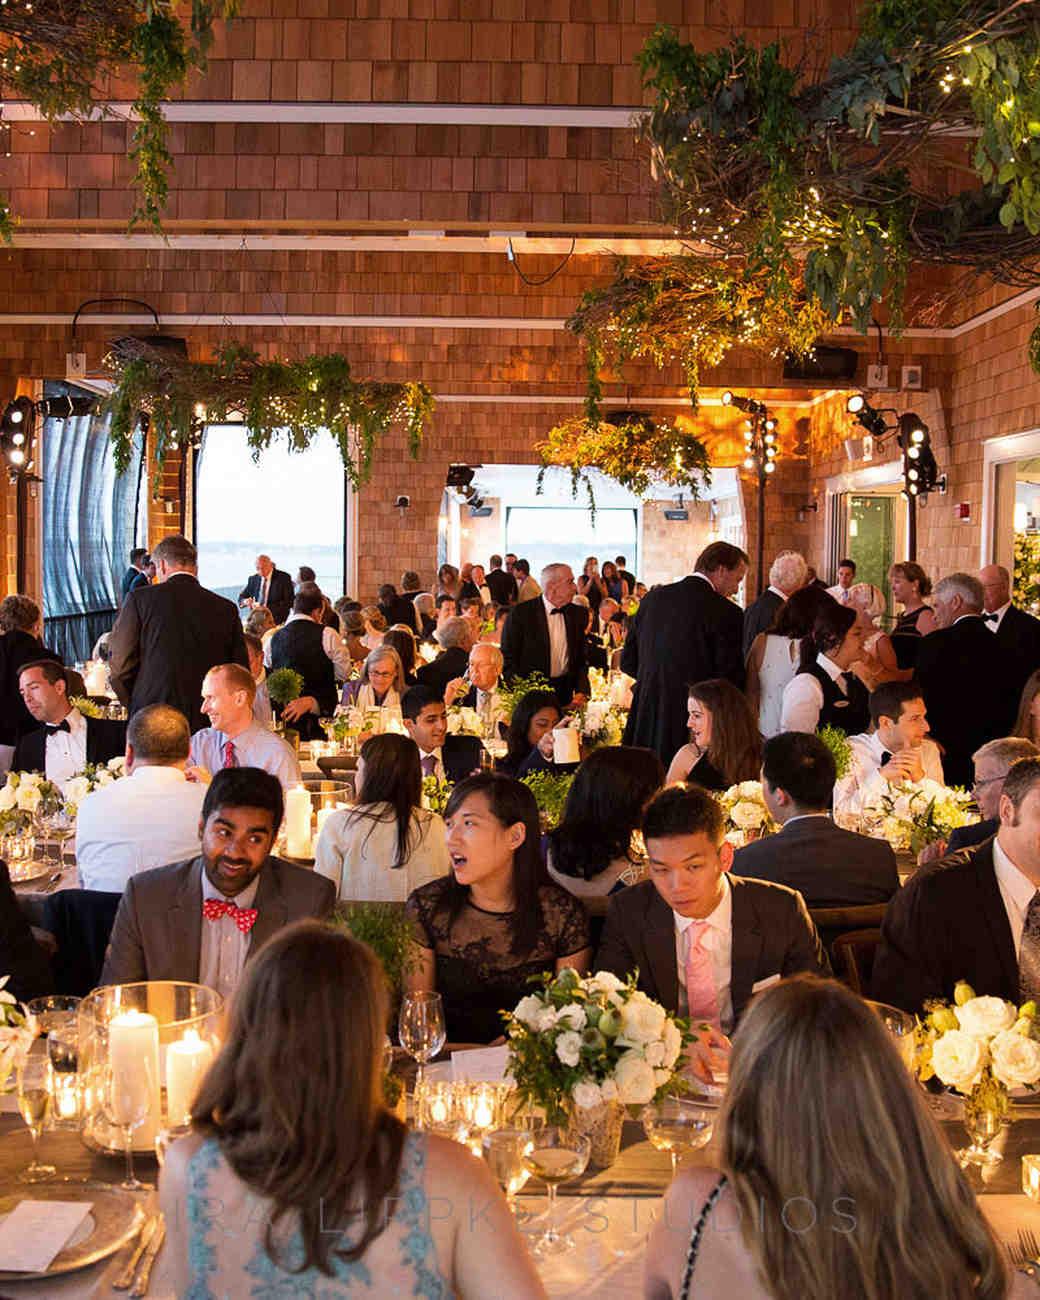 jess-levin-wedding-venue-tips-1-0316.jpg